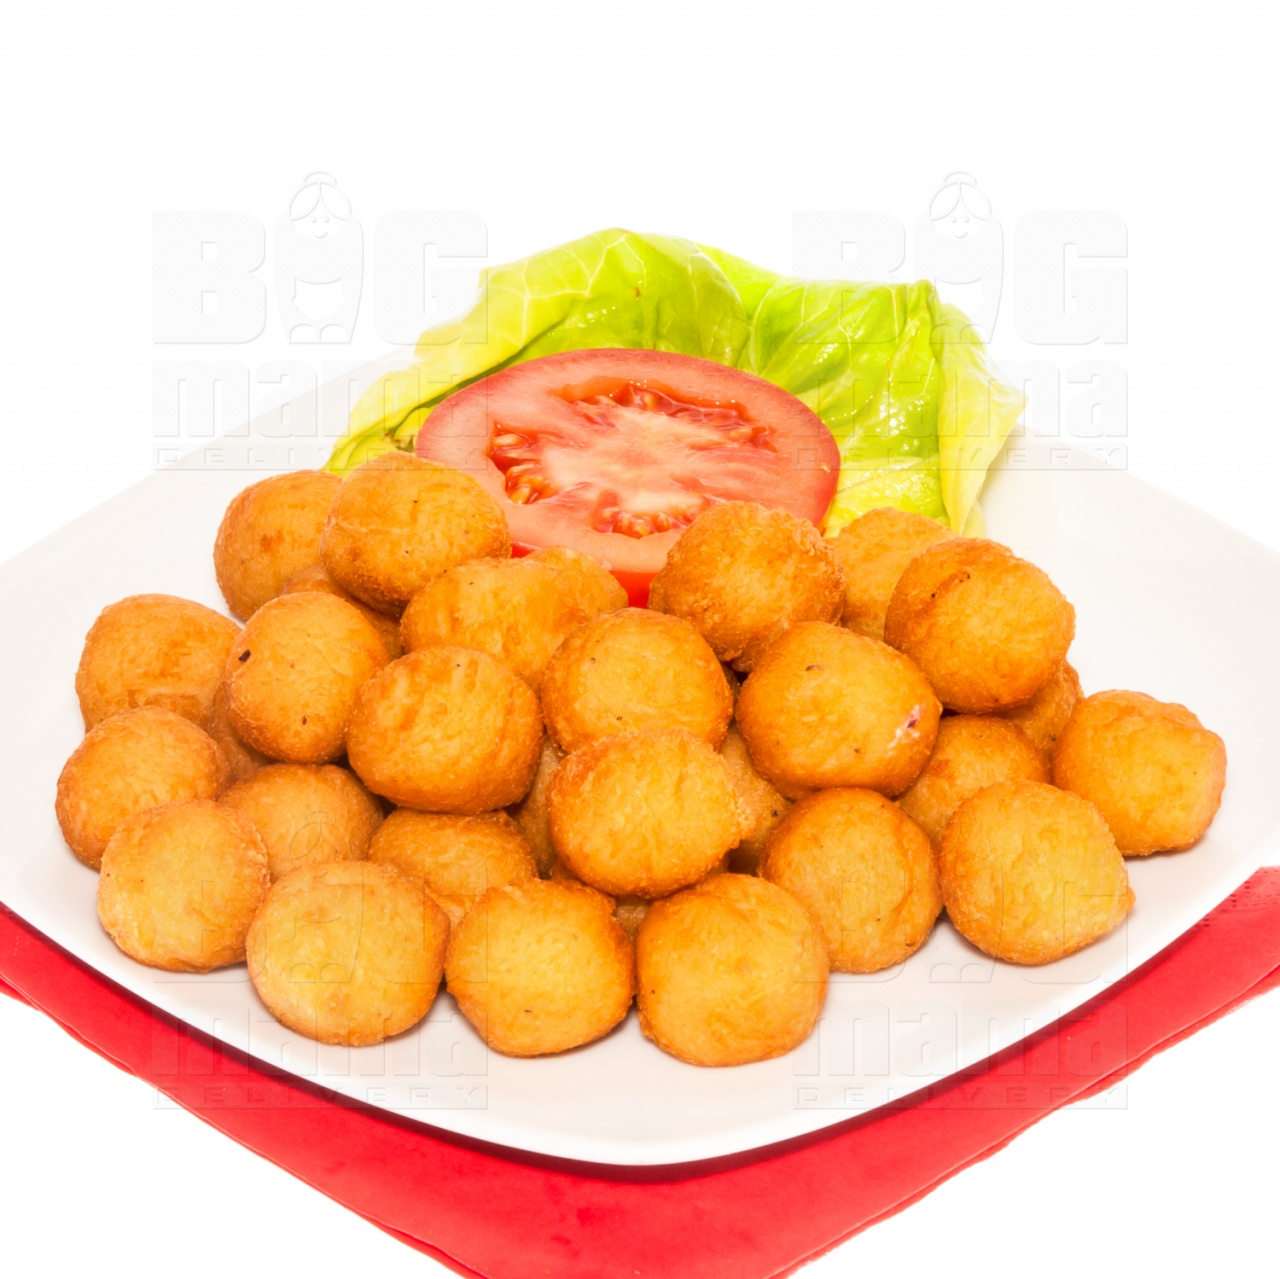 Product #137 image - Crochete de cartofi